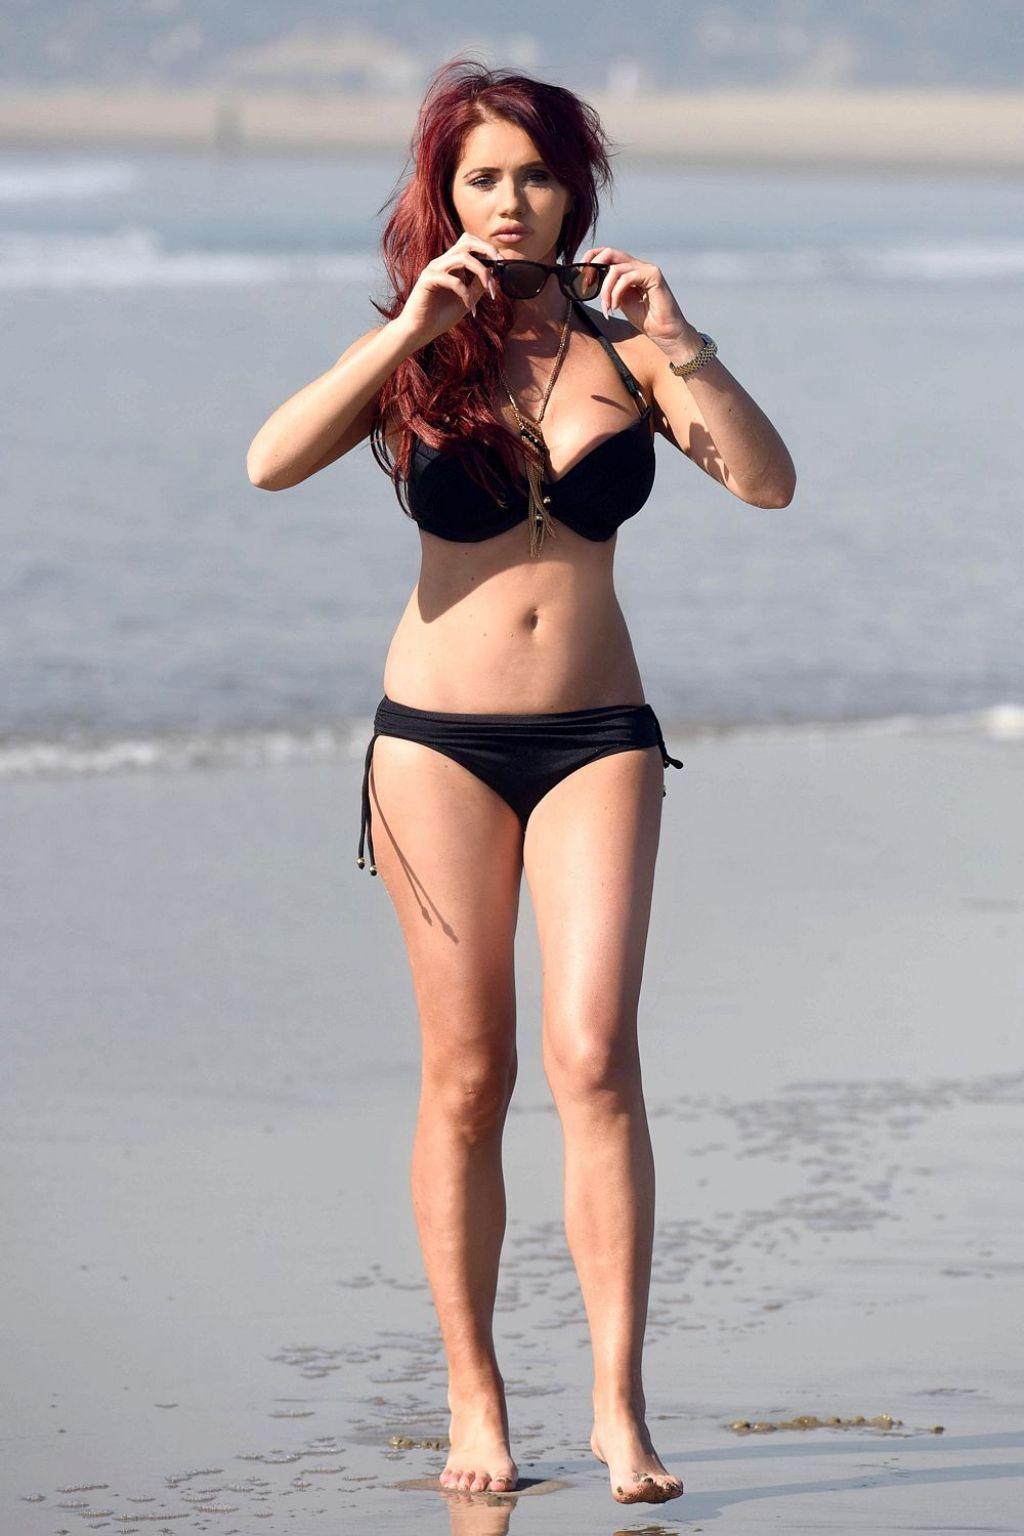 Amy Childs In A Black Bikini On Venice Beach In Los